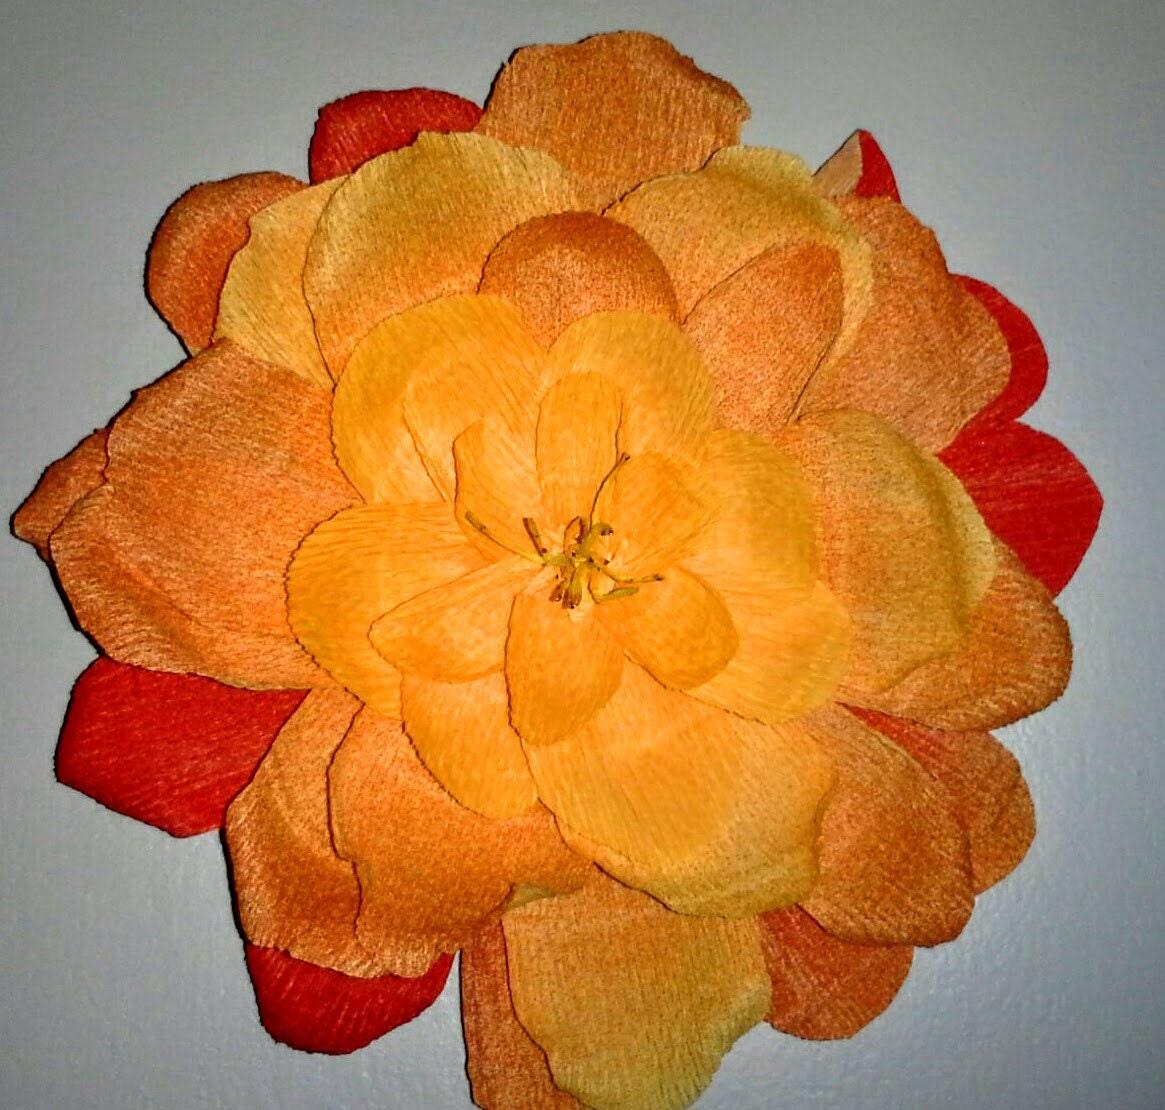 Nuanced orange crepe paper flower wall decor table decor for Crepe paper wall flowers